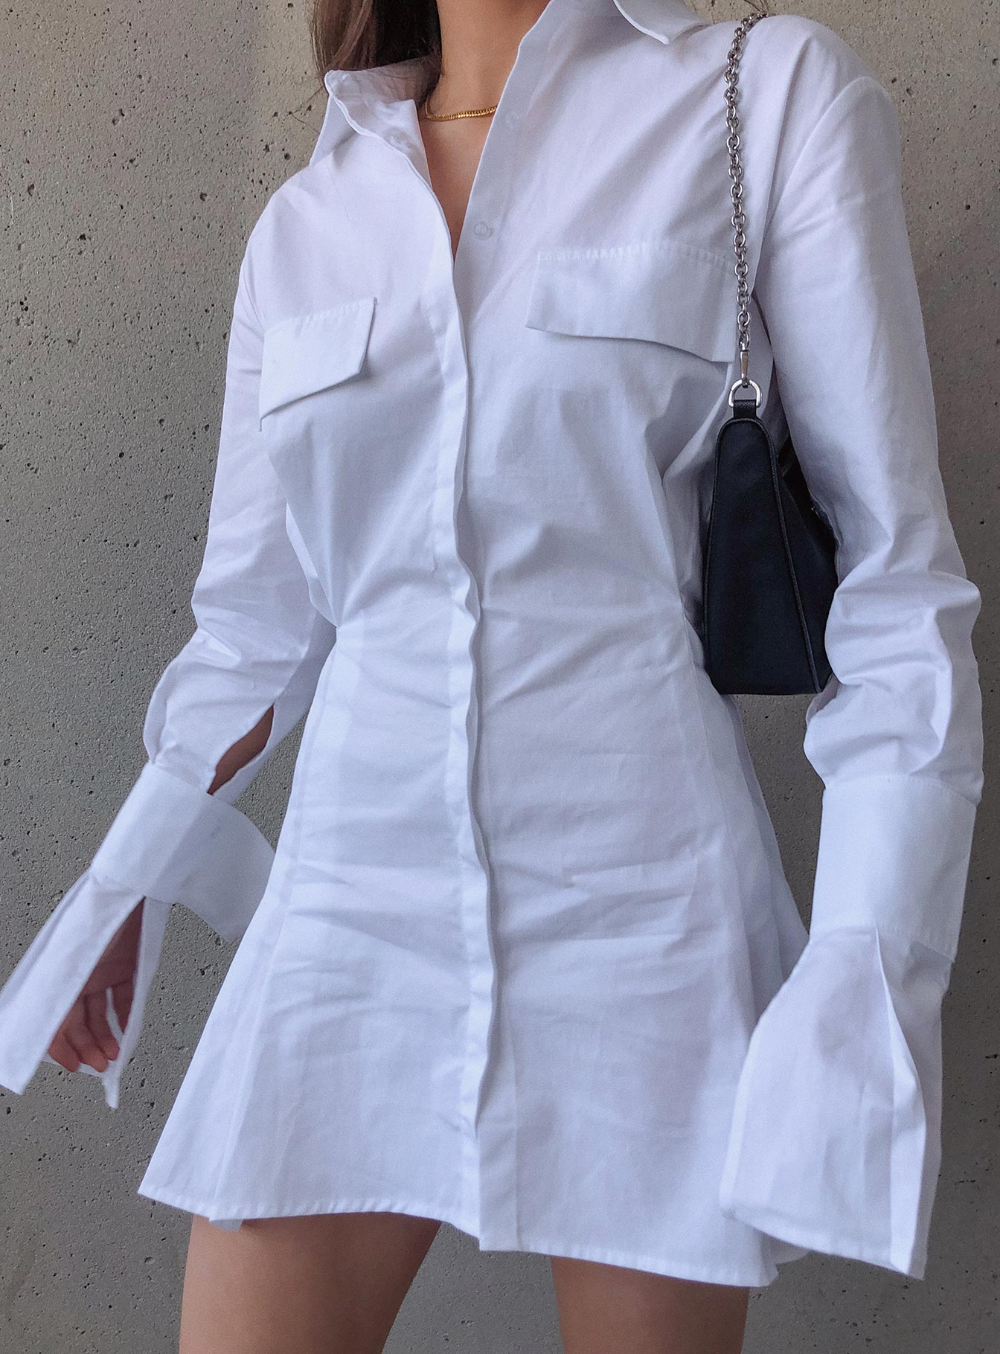 Cover Girl Mini Dress - US 0 / White